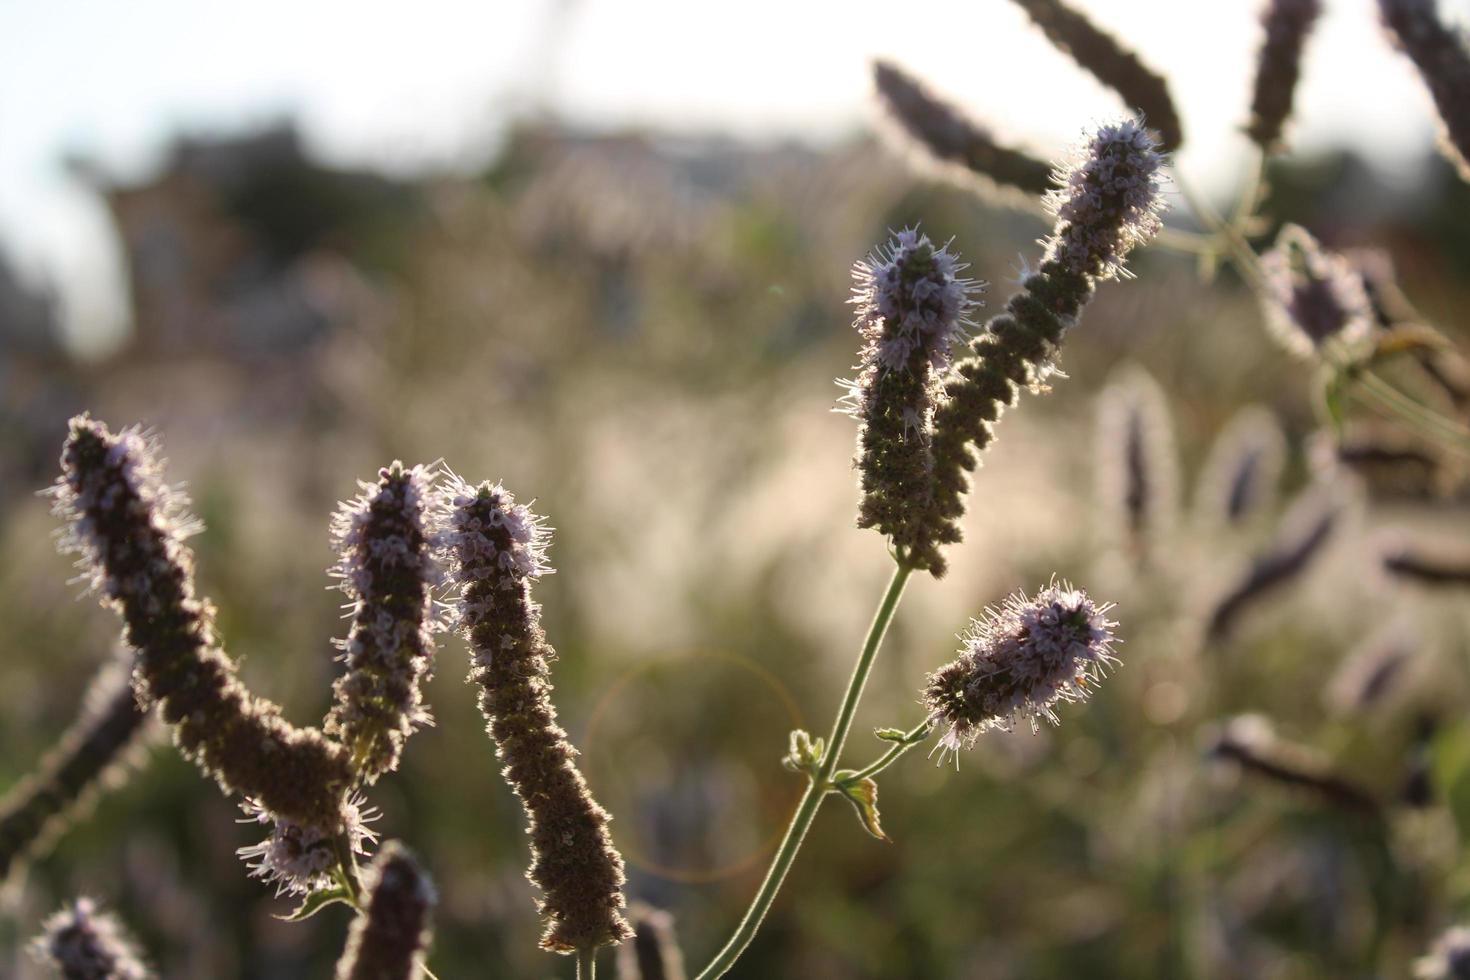 lavendelplant in het voorjaar met macrodetails foto